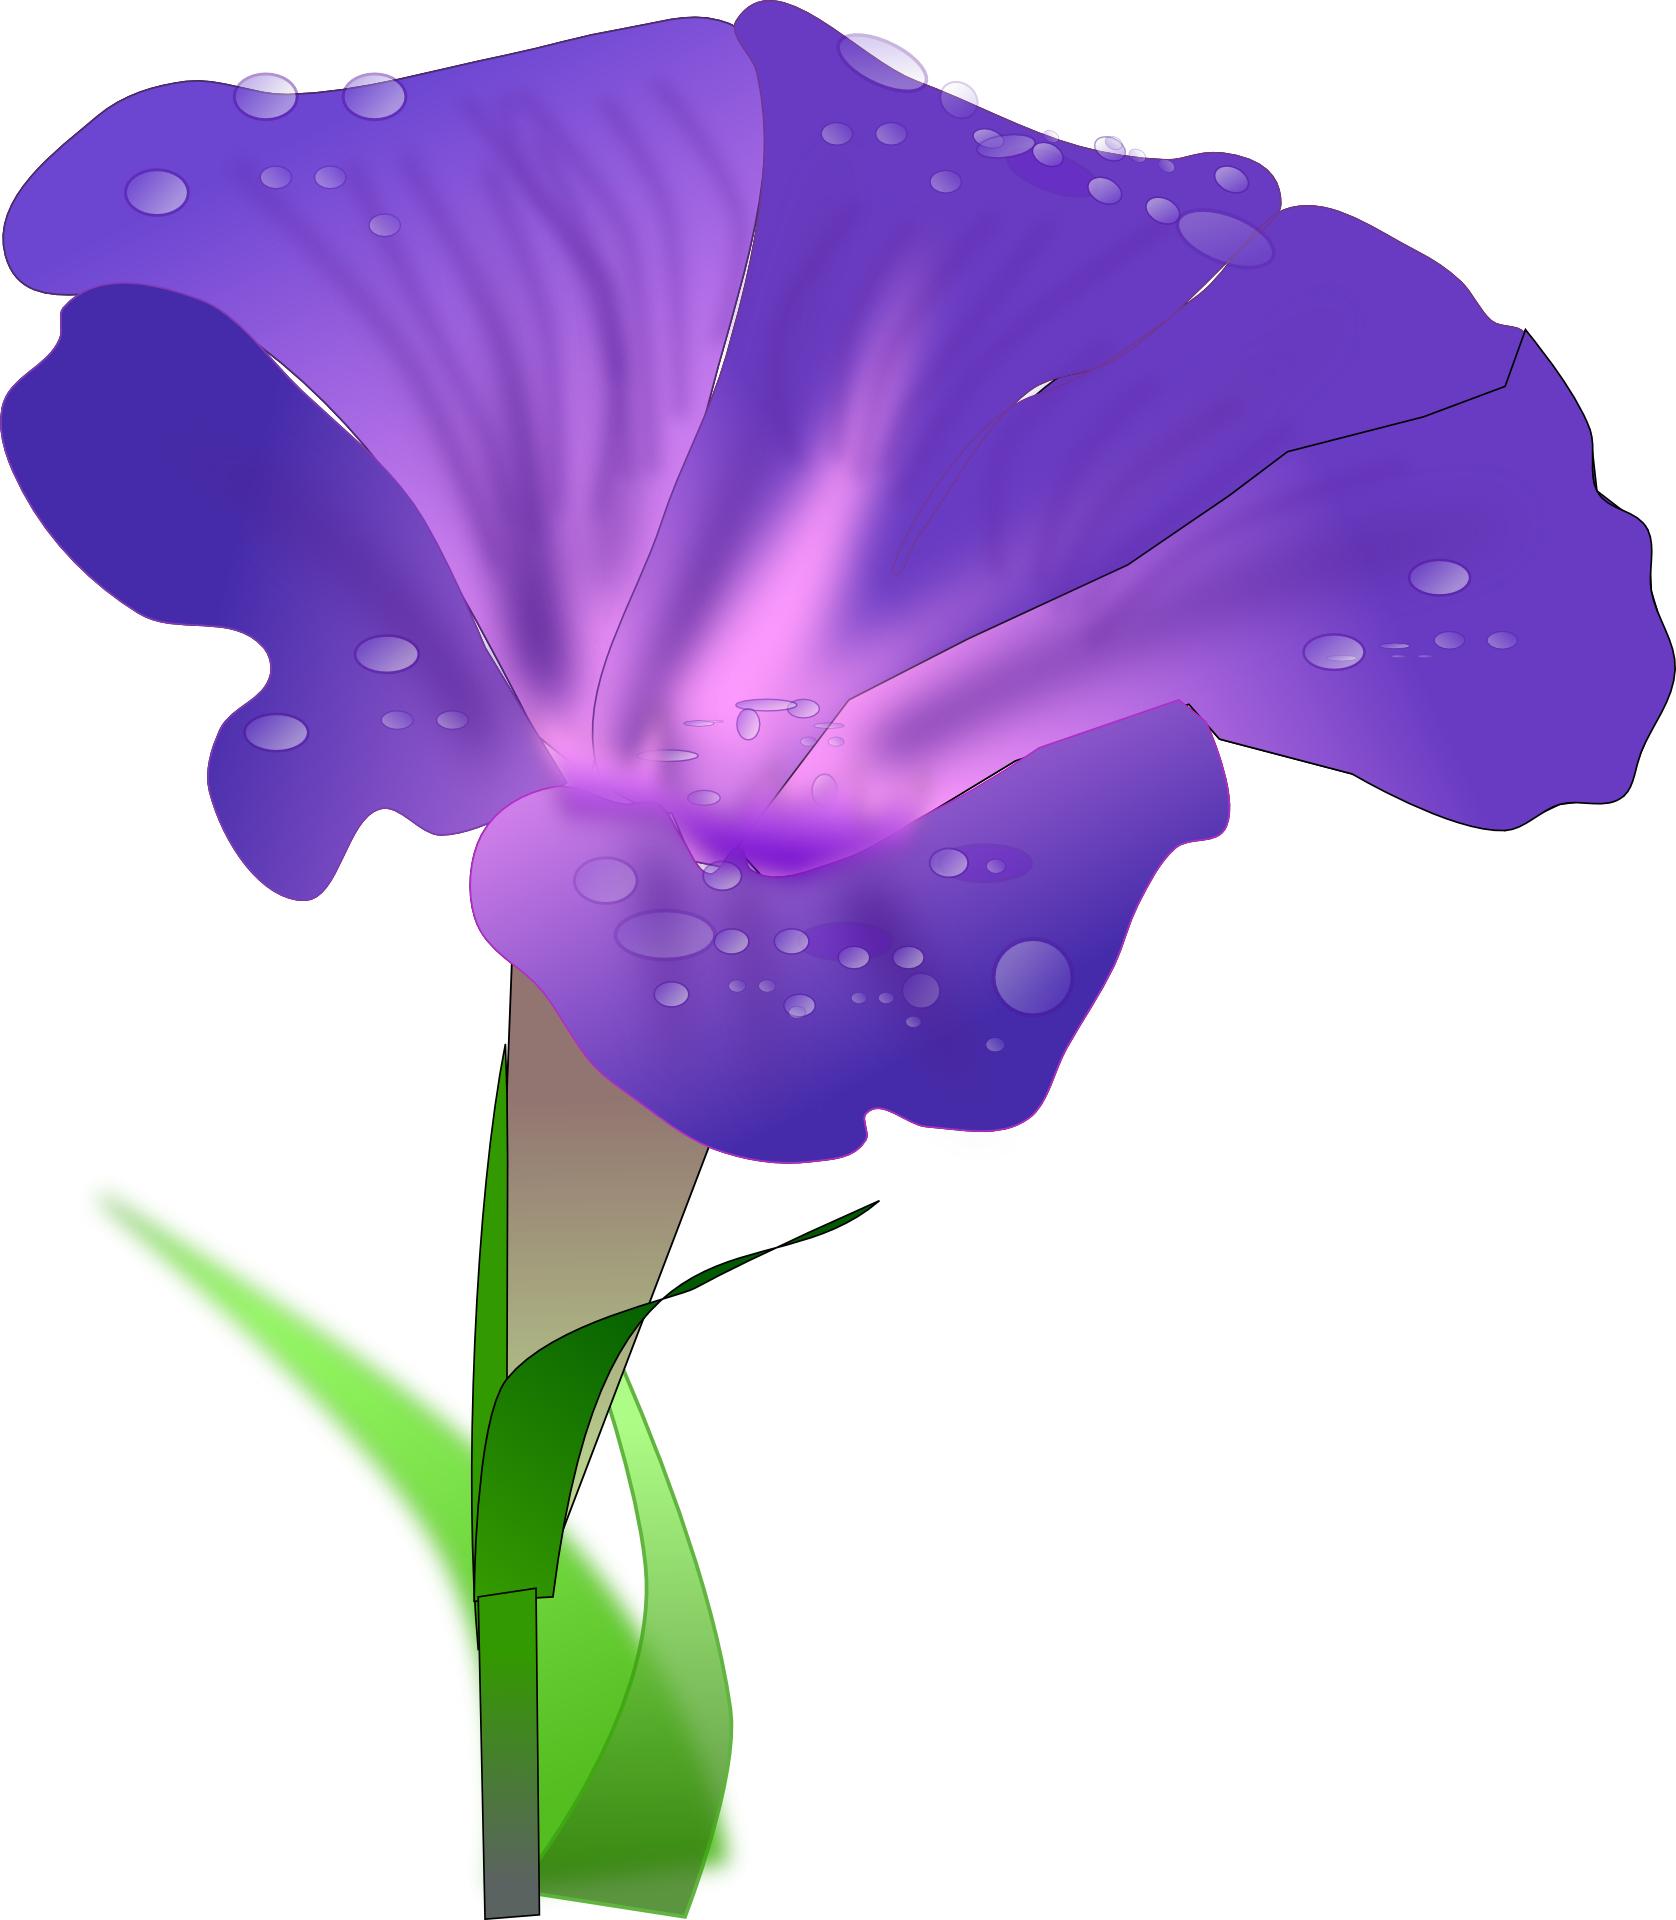 Purple morning glory,dewdrop,flower vector